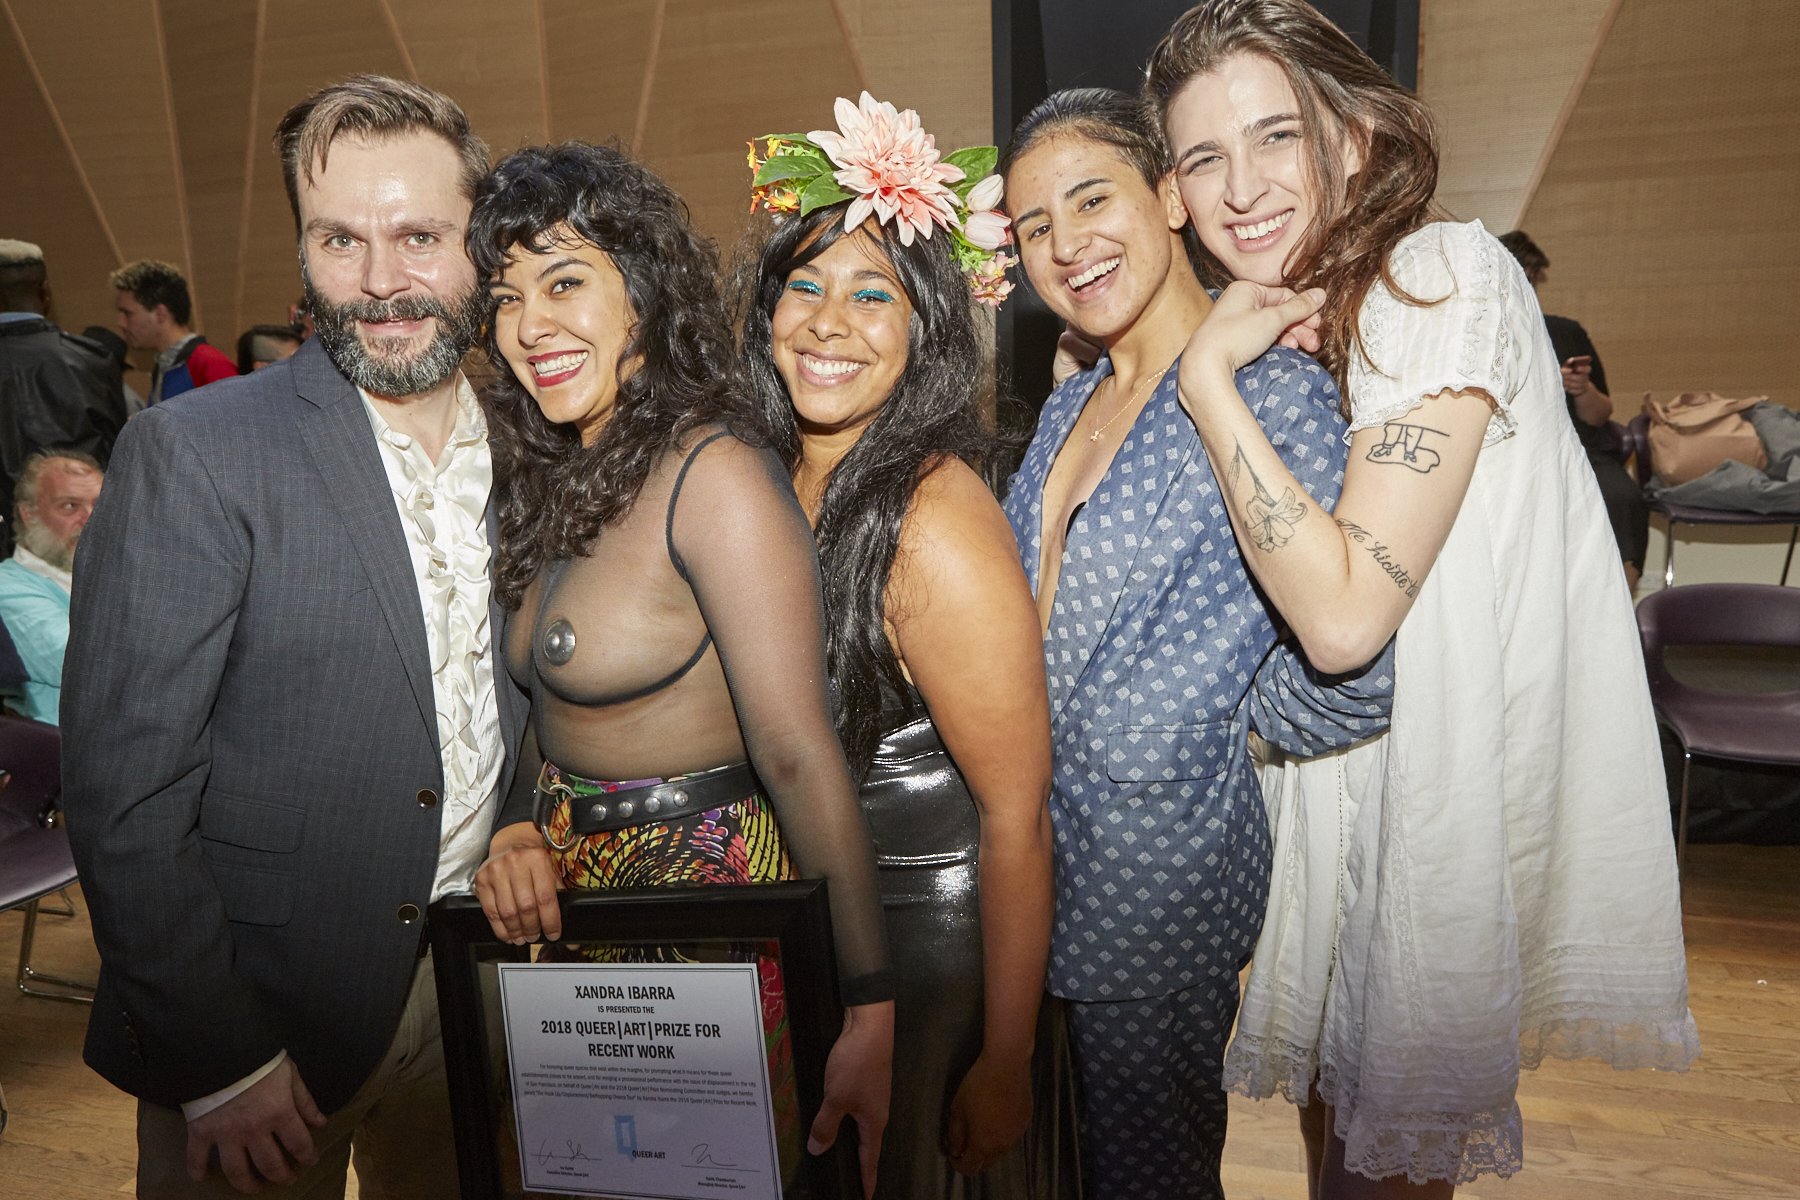 From left: Travis Chamberlain, Xandra Ibarra (2018 Recent Work Winner), Vivian Crockett, KT Pe Benito, and Rio Sofia